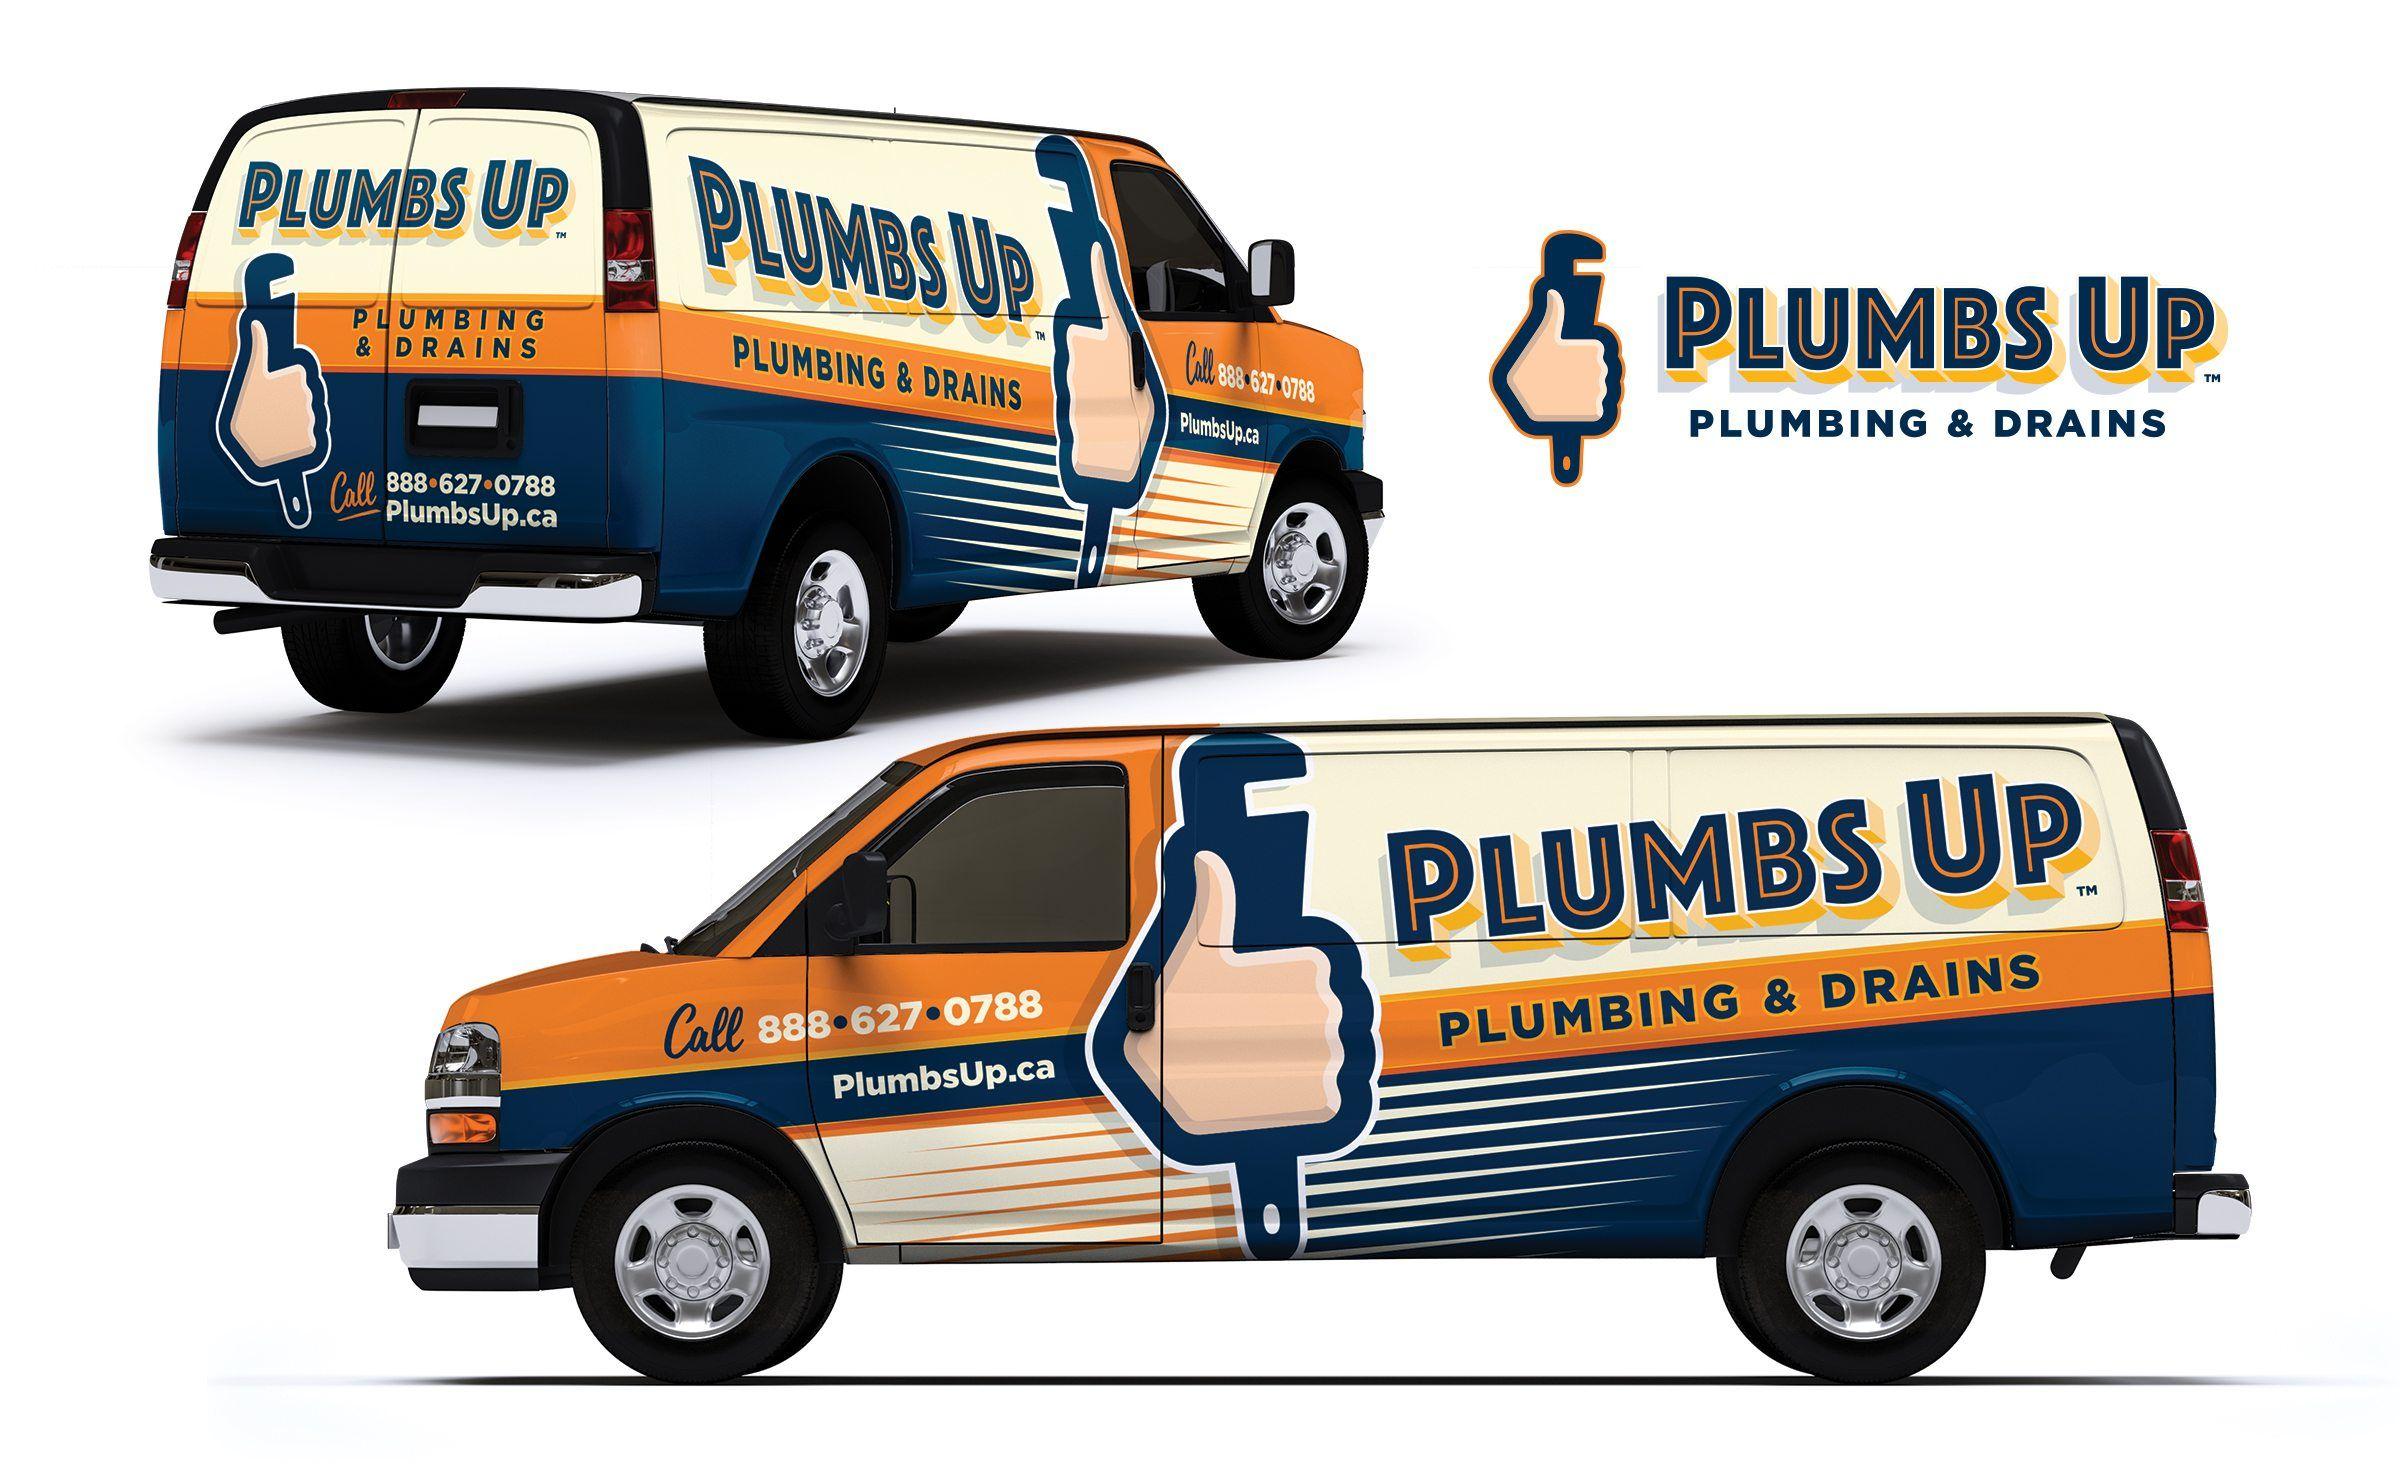 Truck Wrap Design For Plumbs Up Plumbing Draining Nj